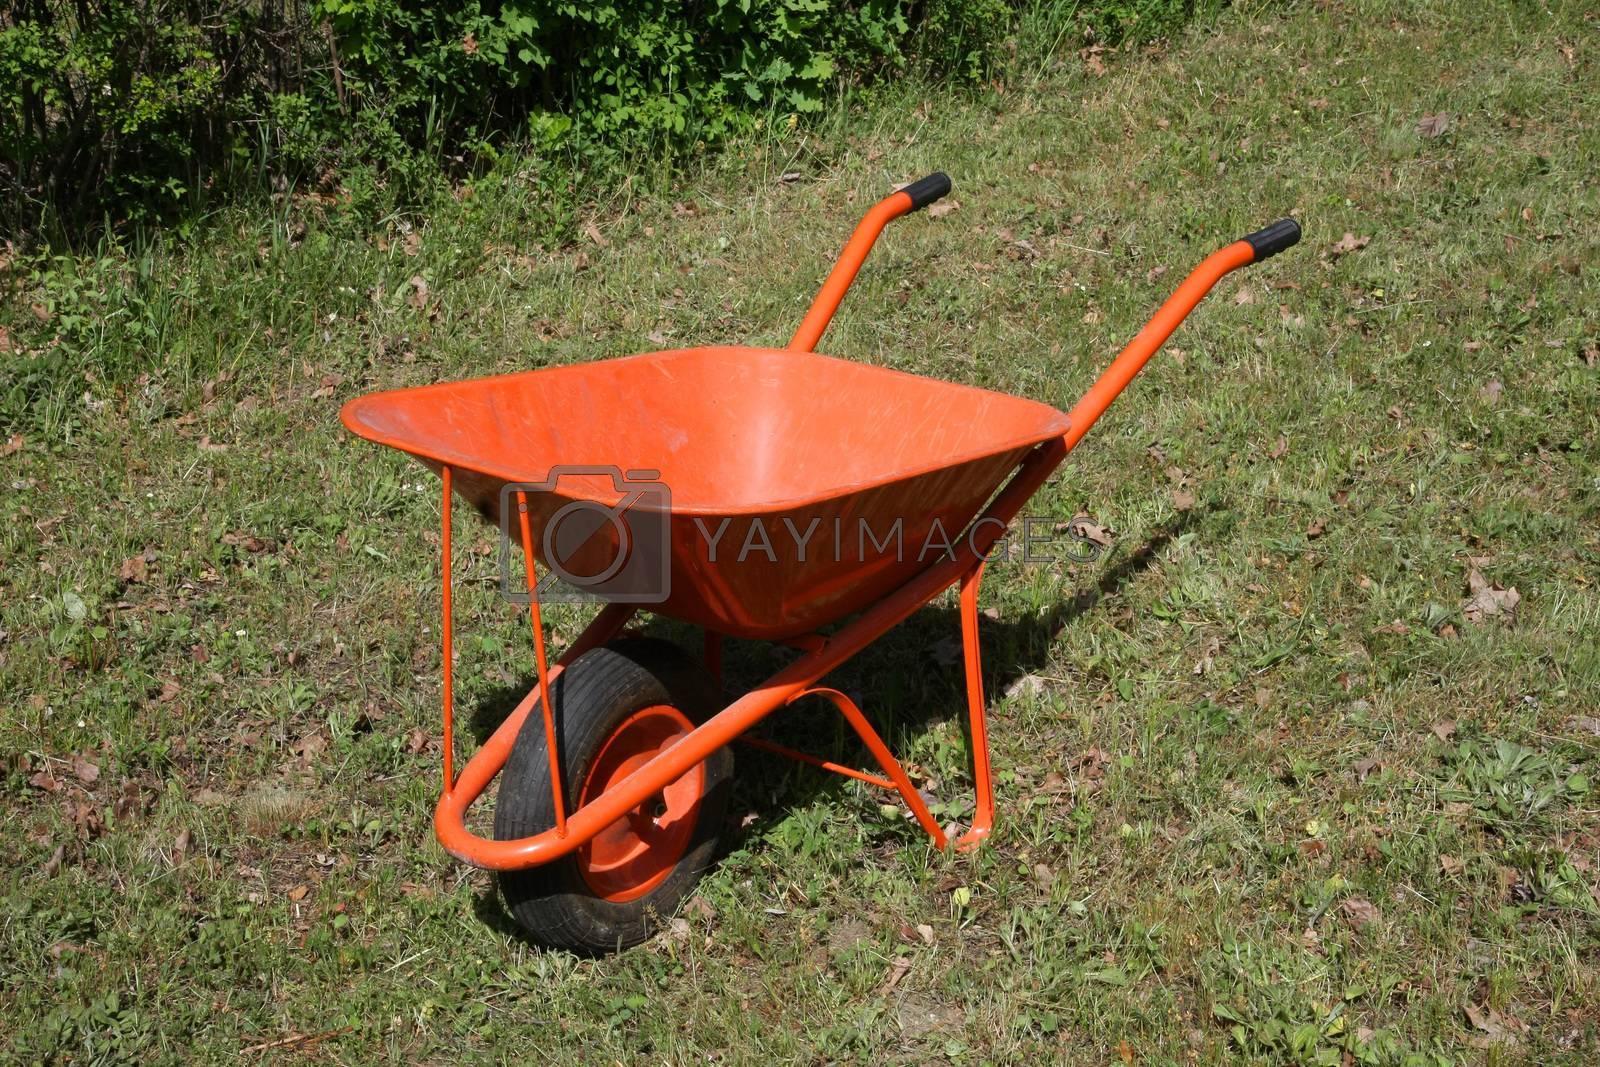 Vivid Orange handwagon in the field